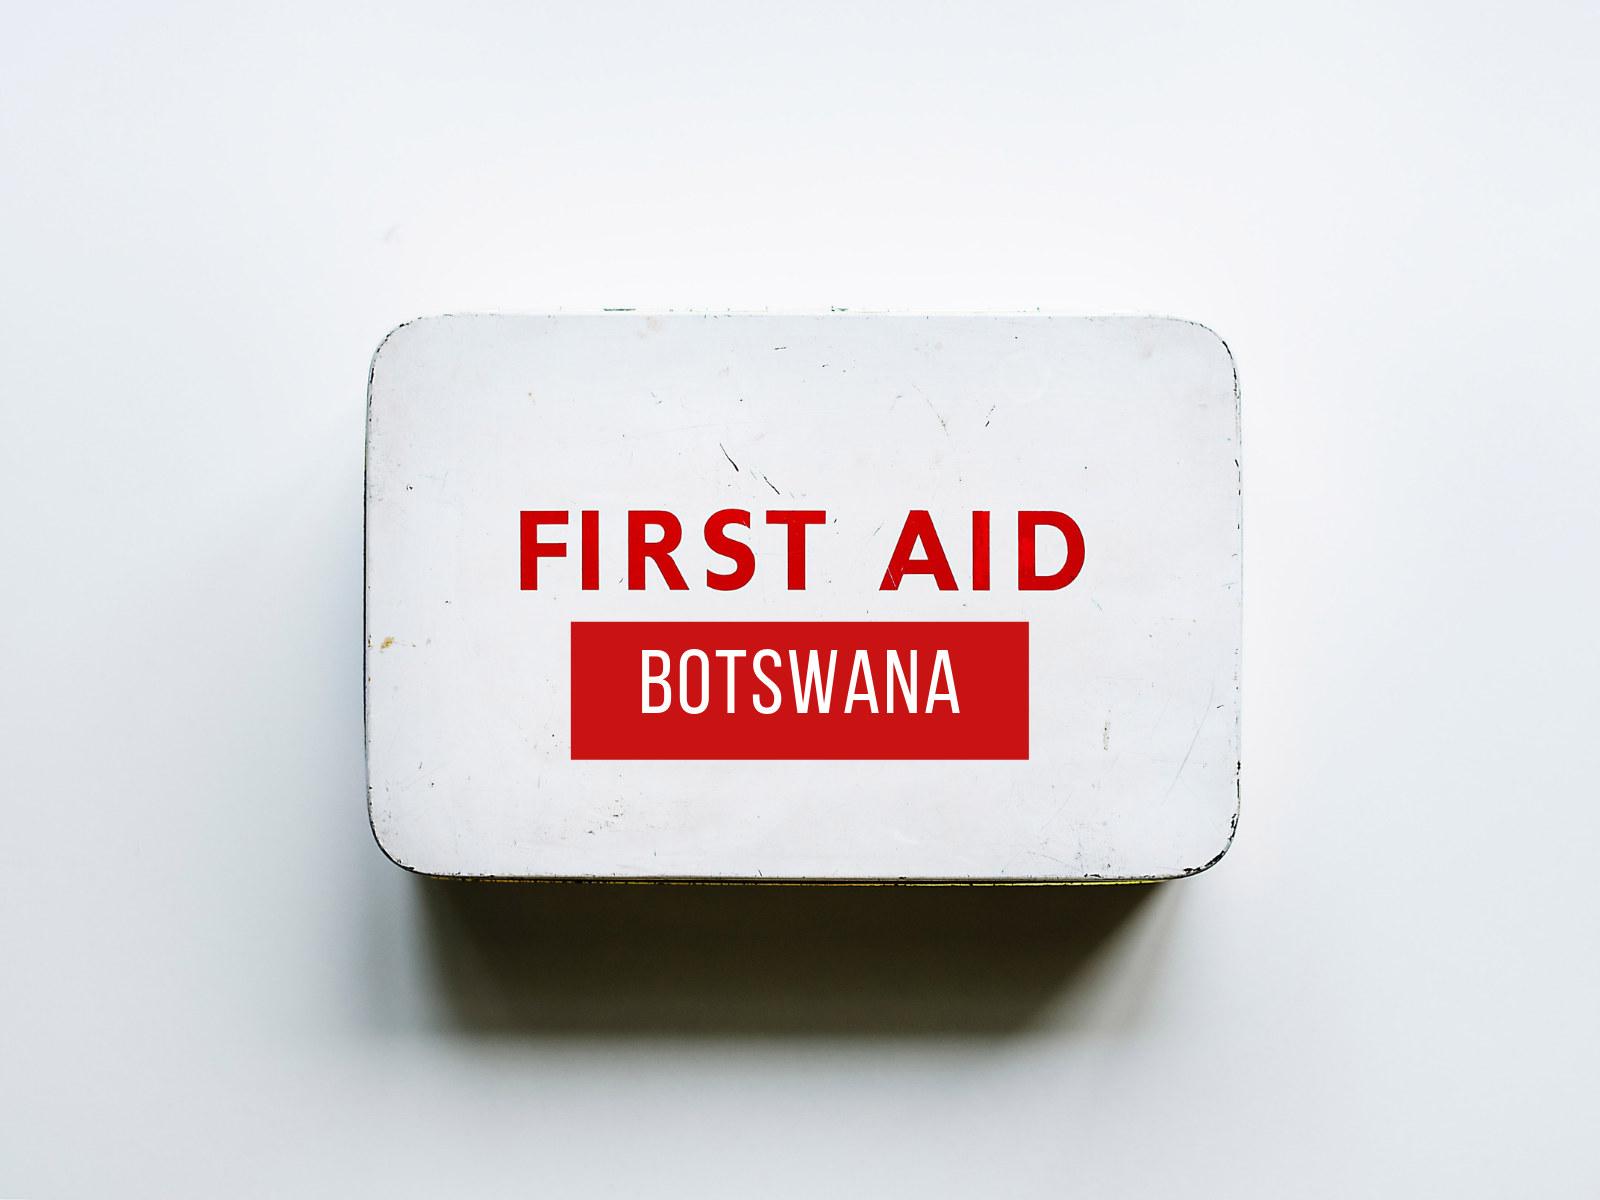 Botswana First Aid app